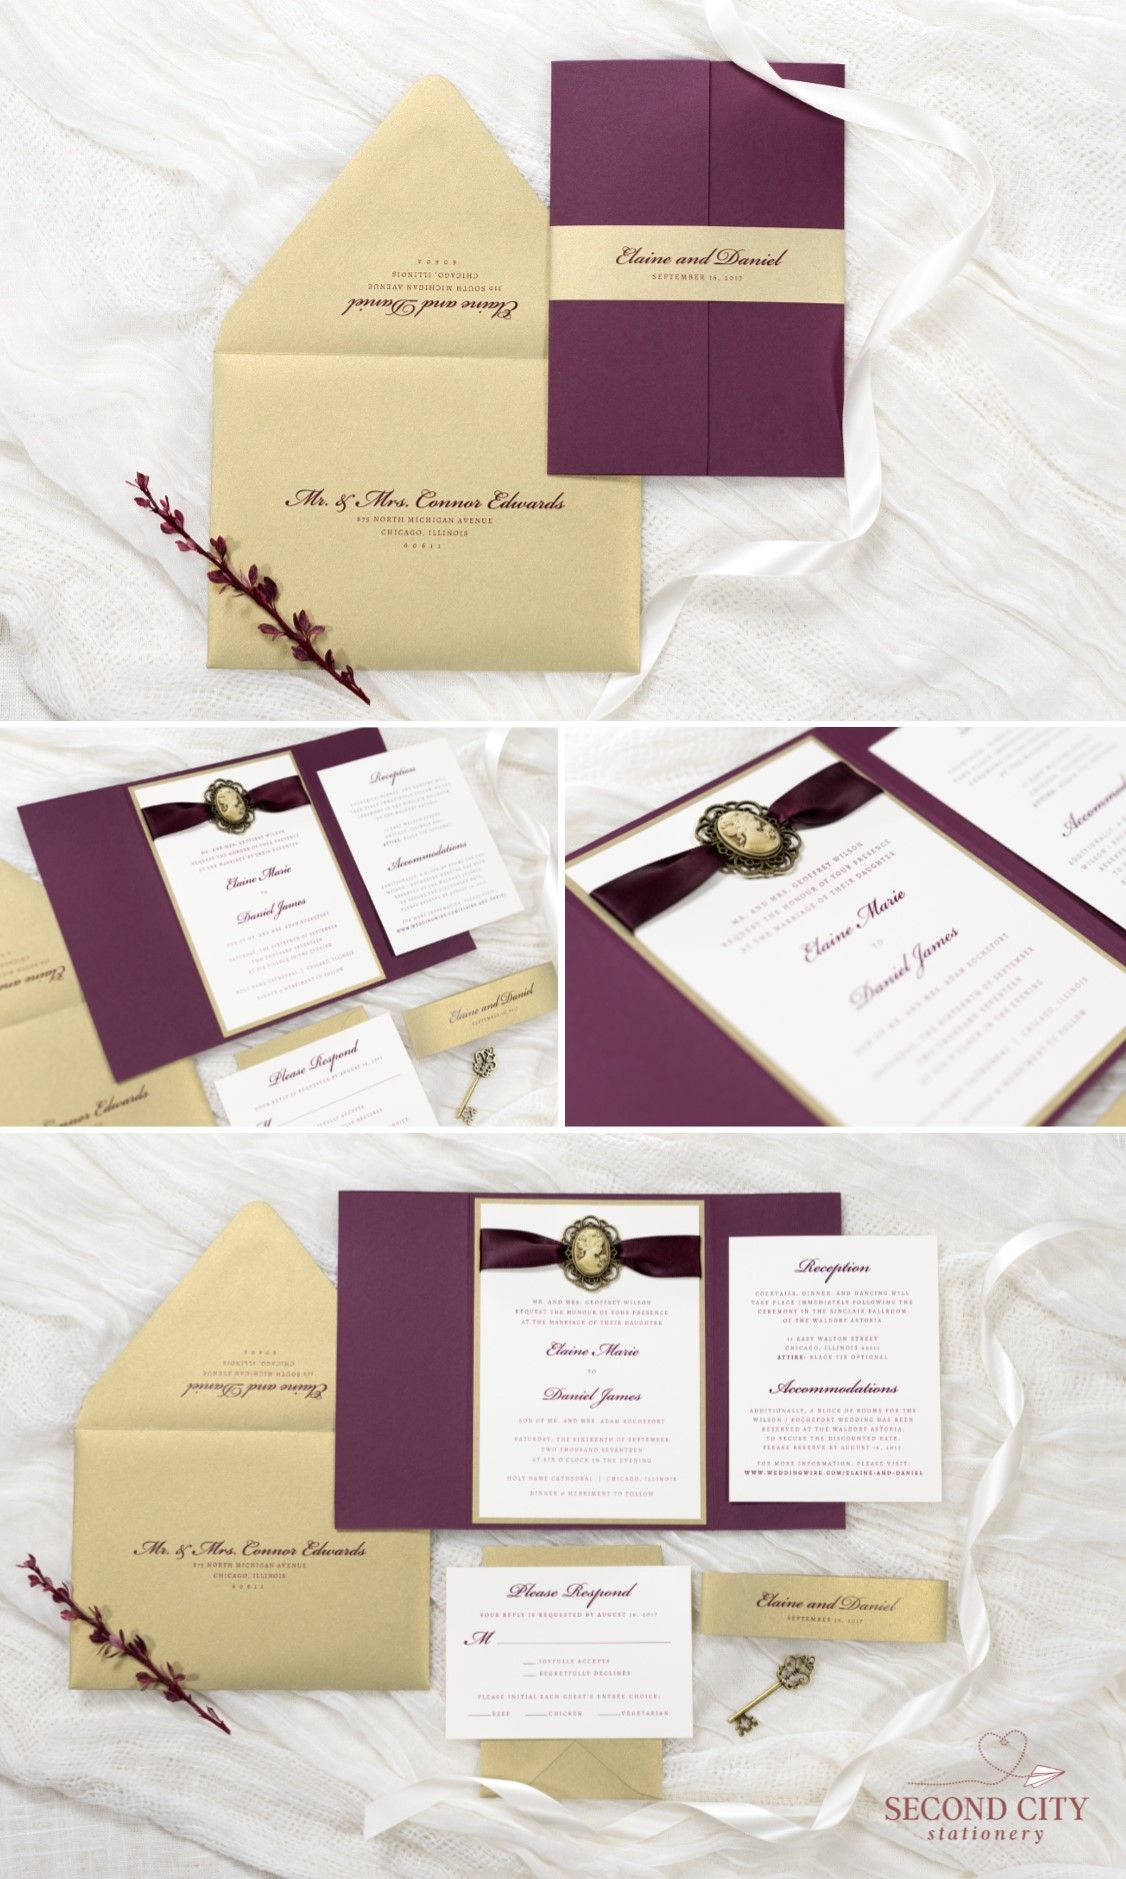 Antique Theme | Gatefold Wedding Invitation with Vintage Style Cameo ...